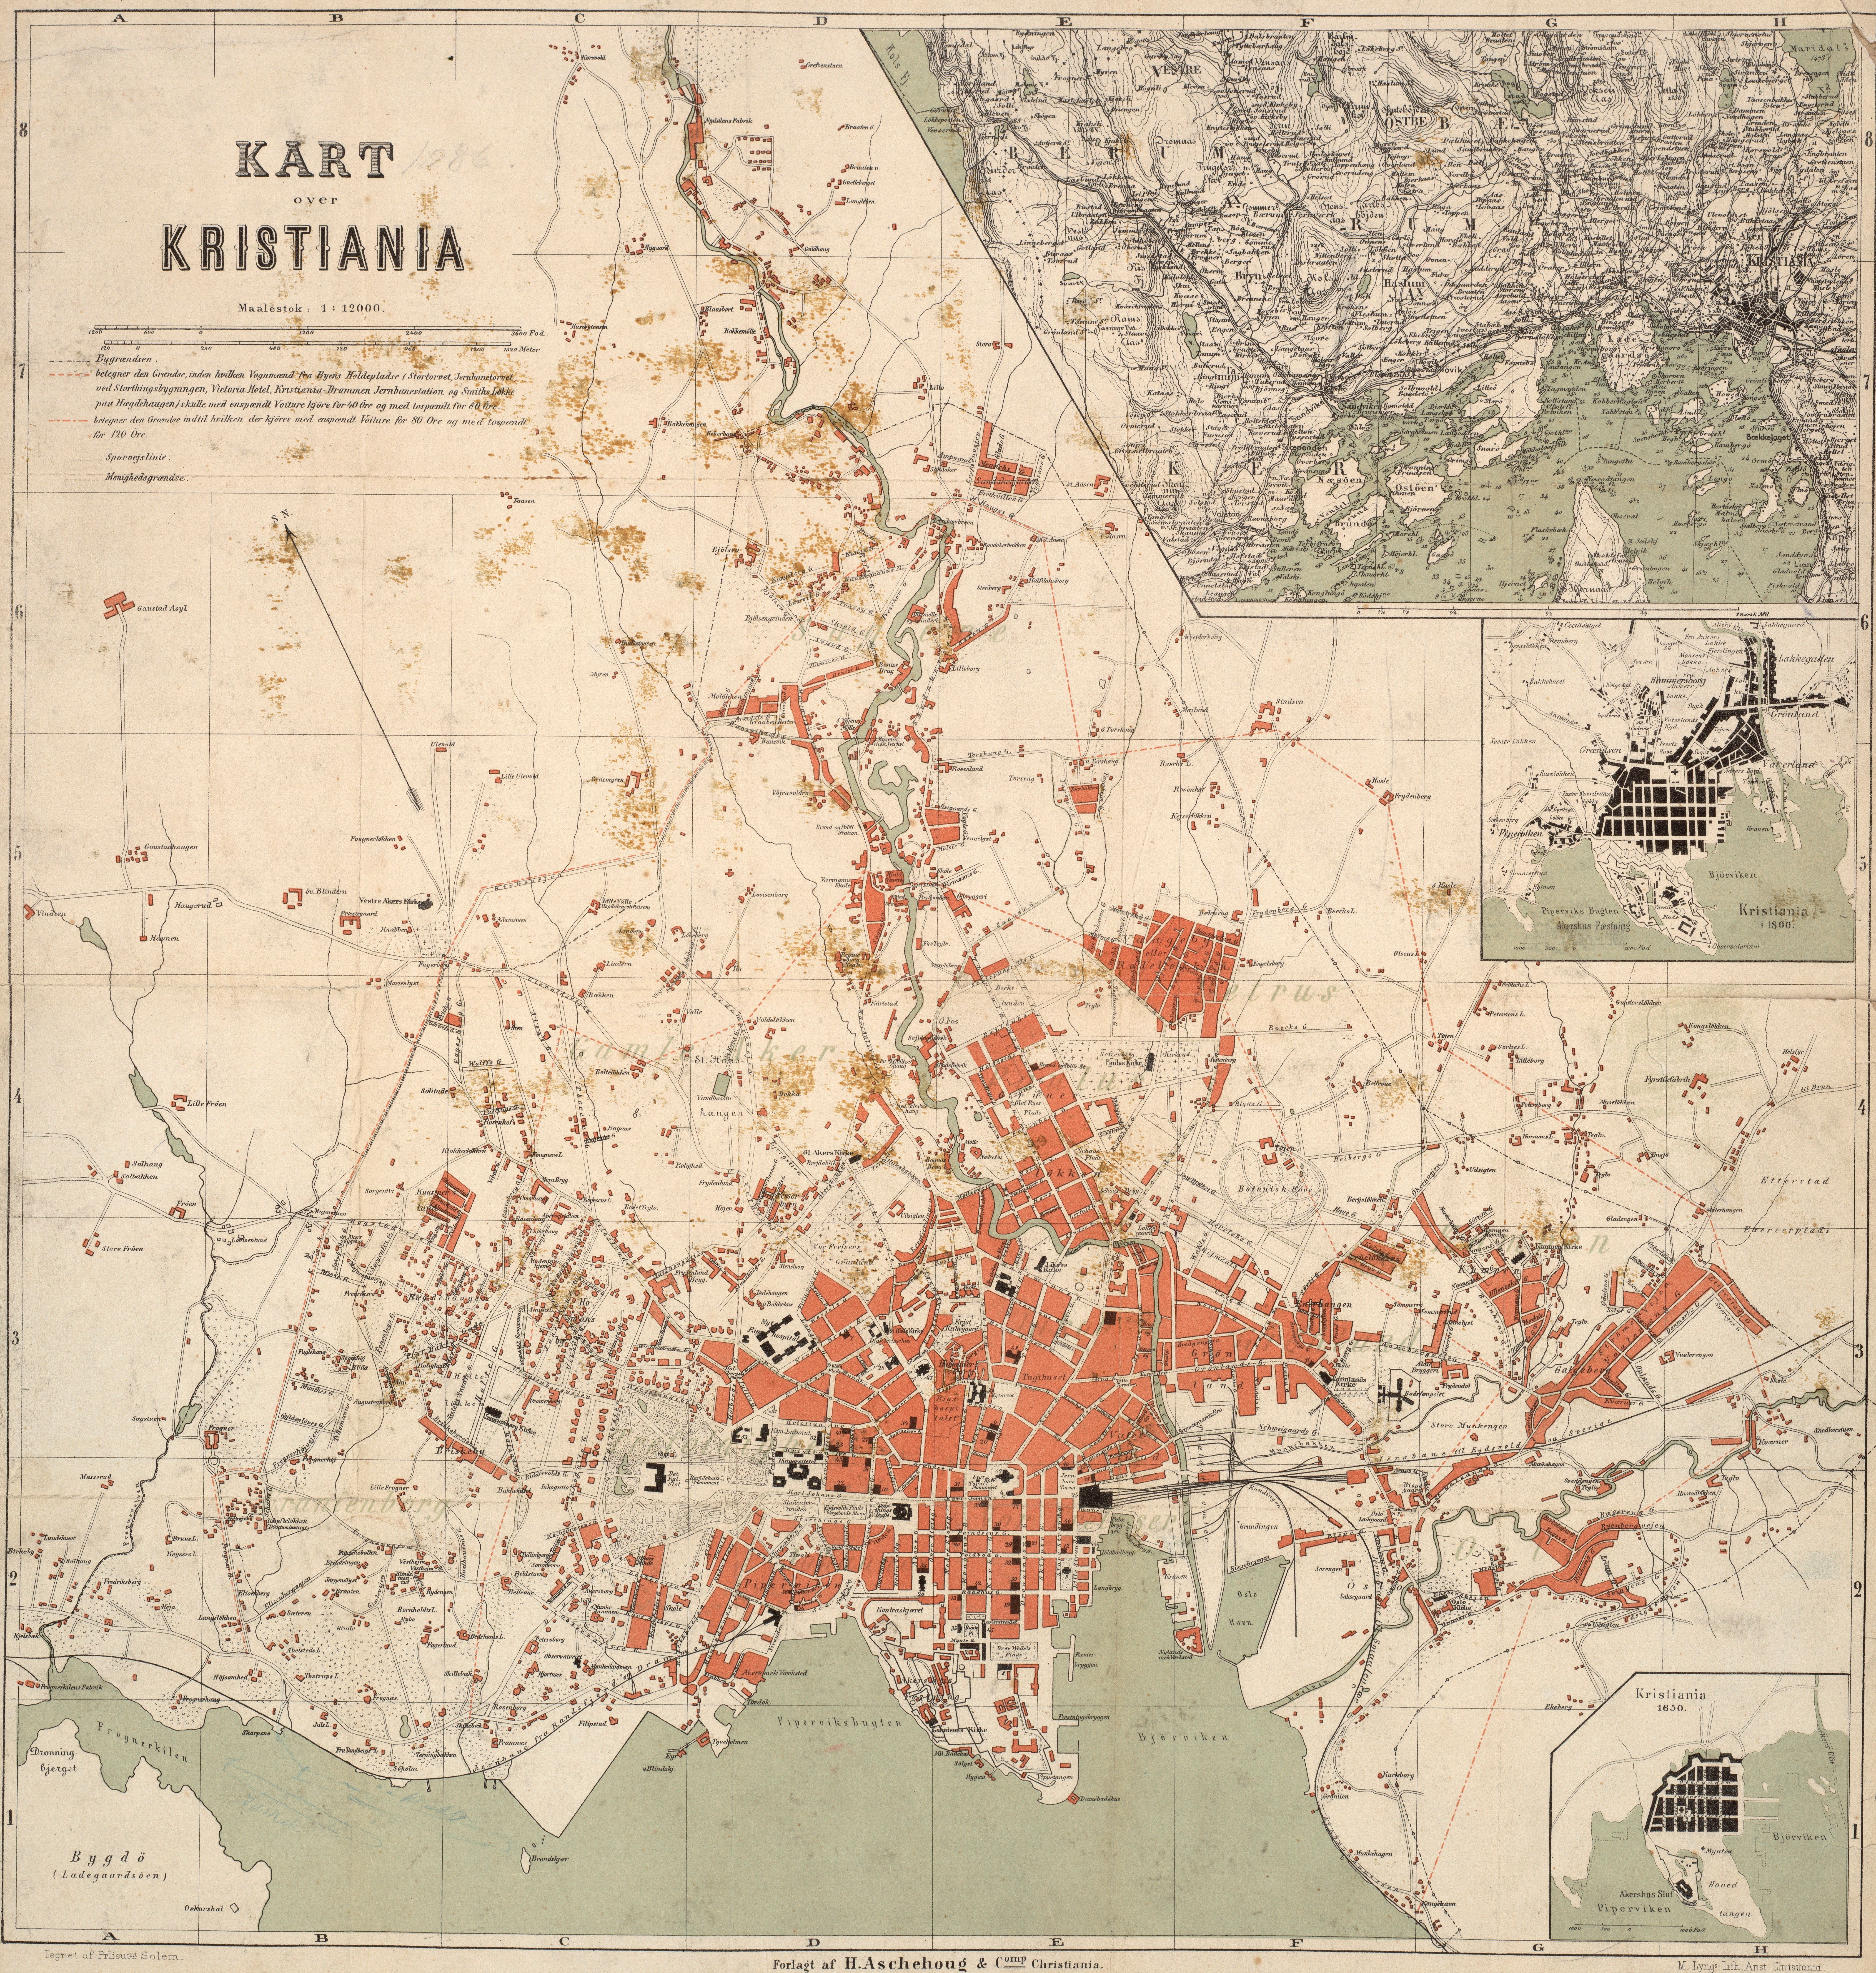 kristiania kart File:Kart over Kristiania   no nb krt 00795.   Wikimedia Commons kristiania kart